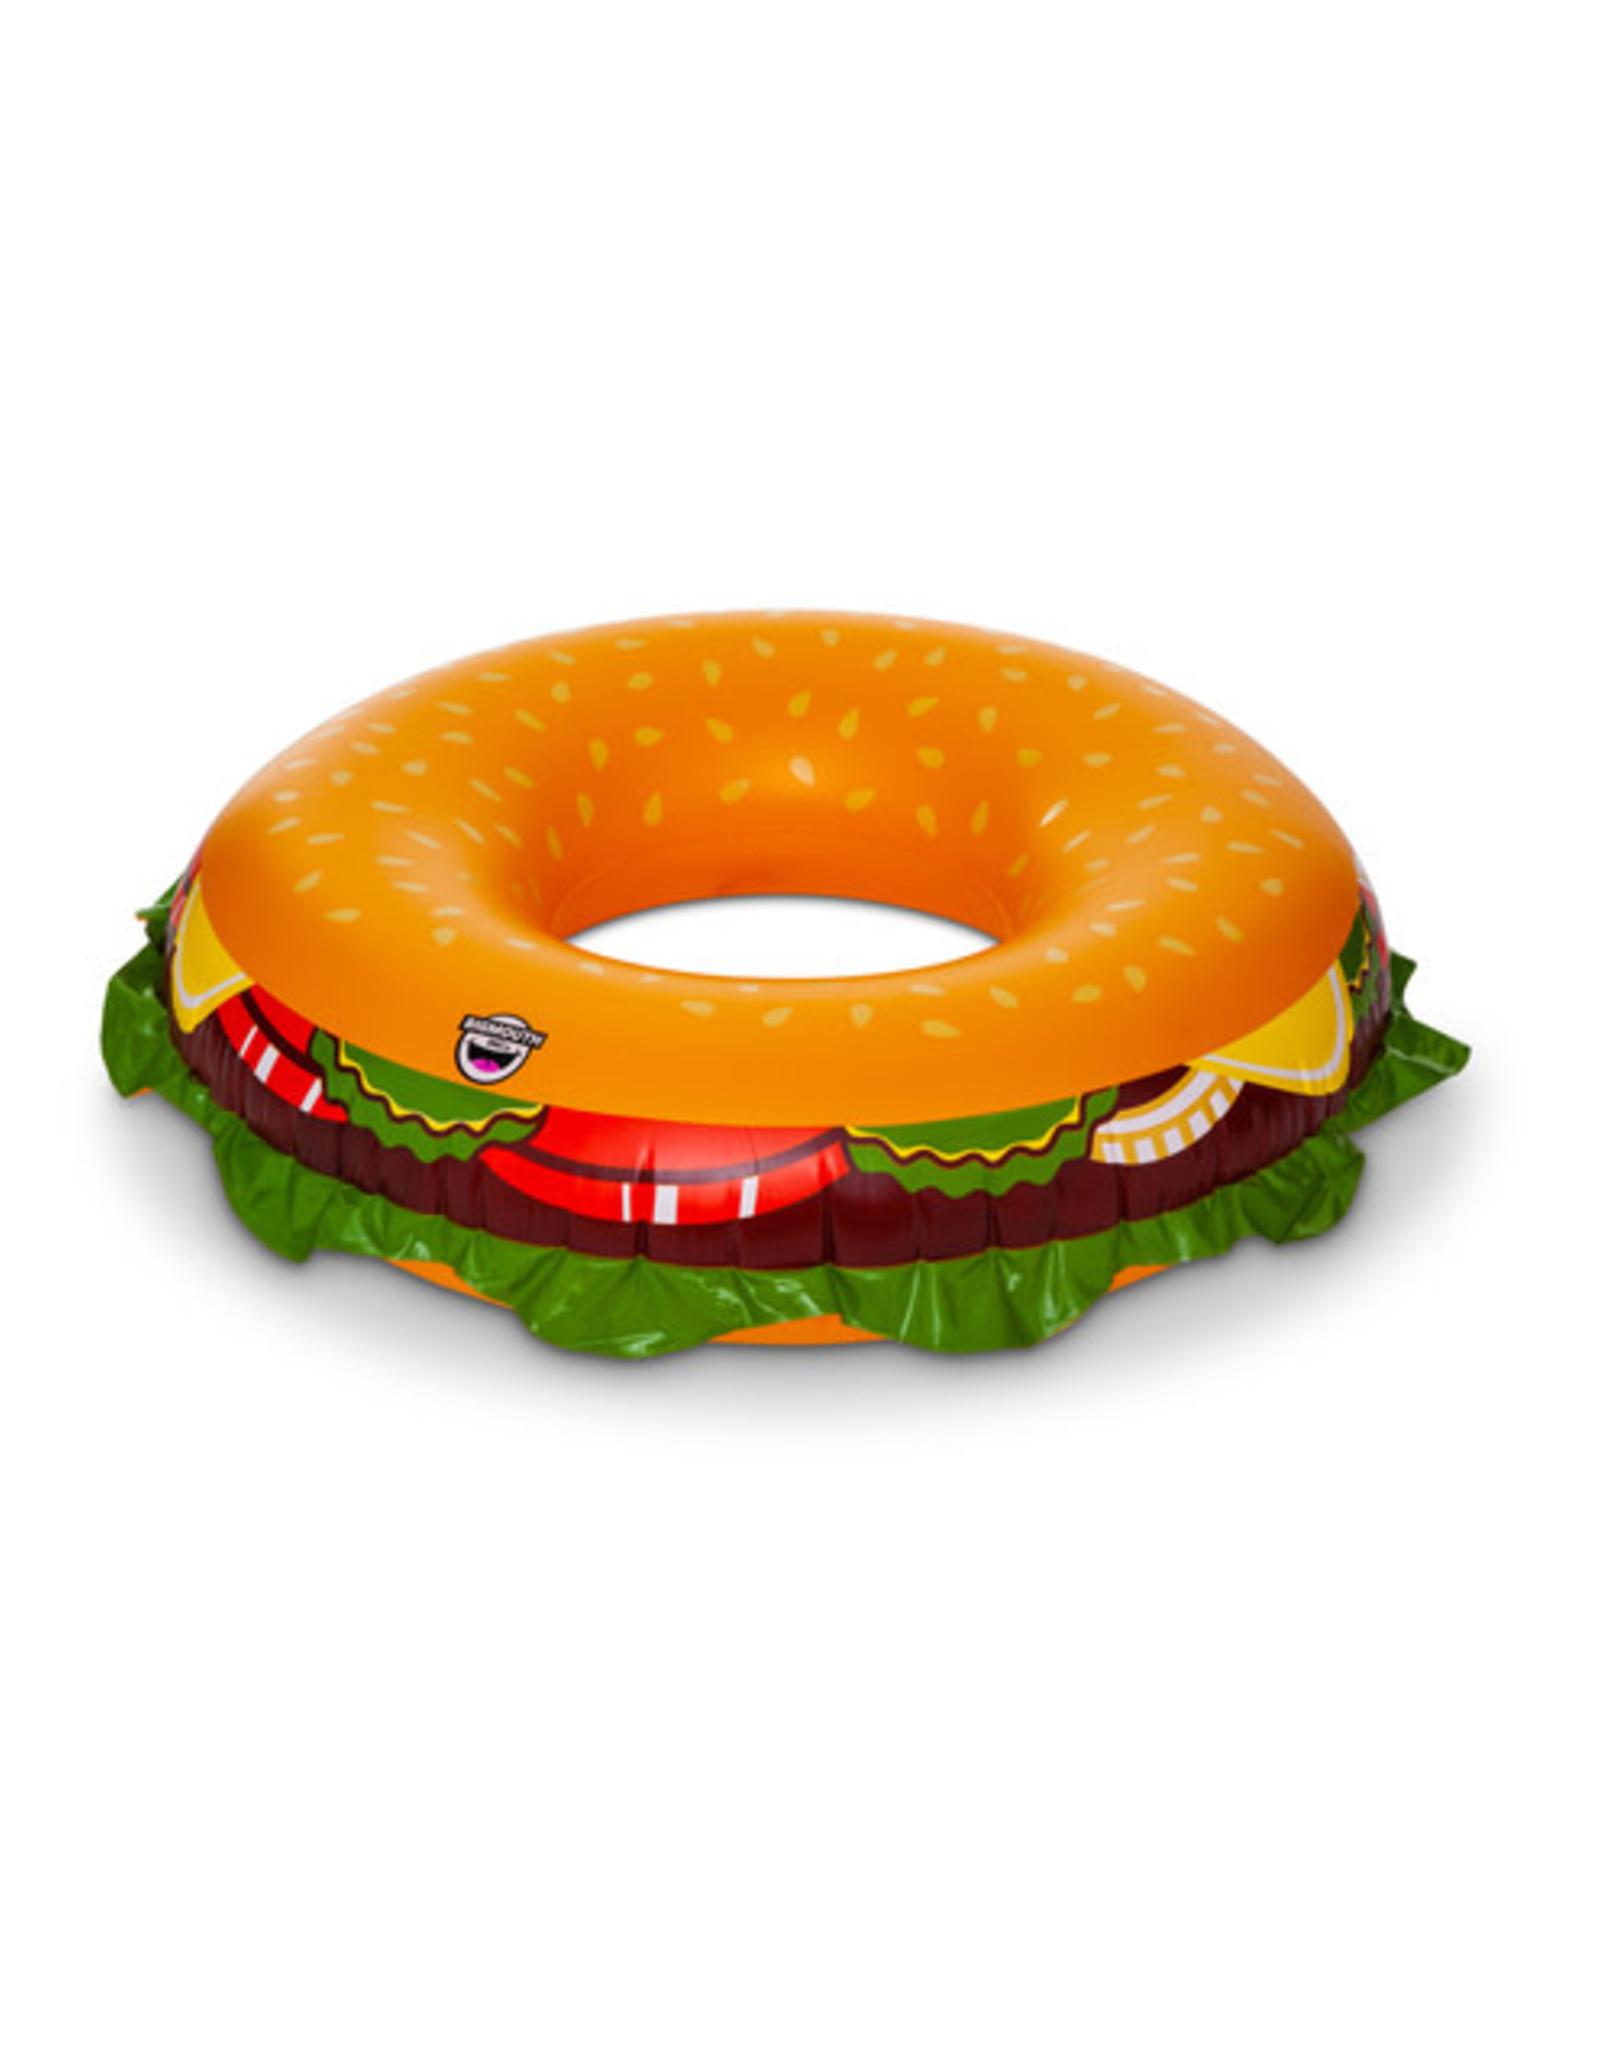 BigMouth Summer Cheeseburger Pool Float